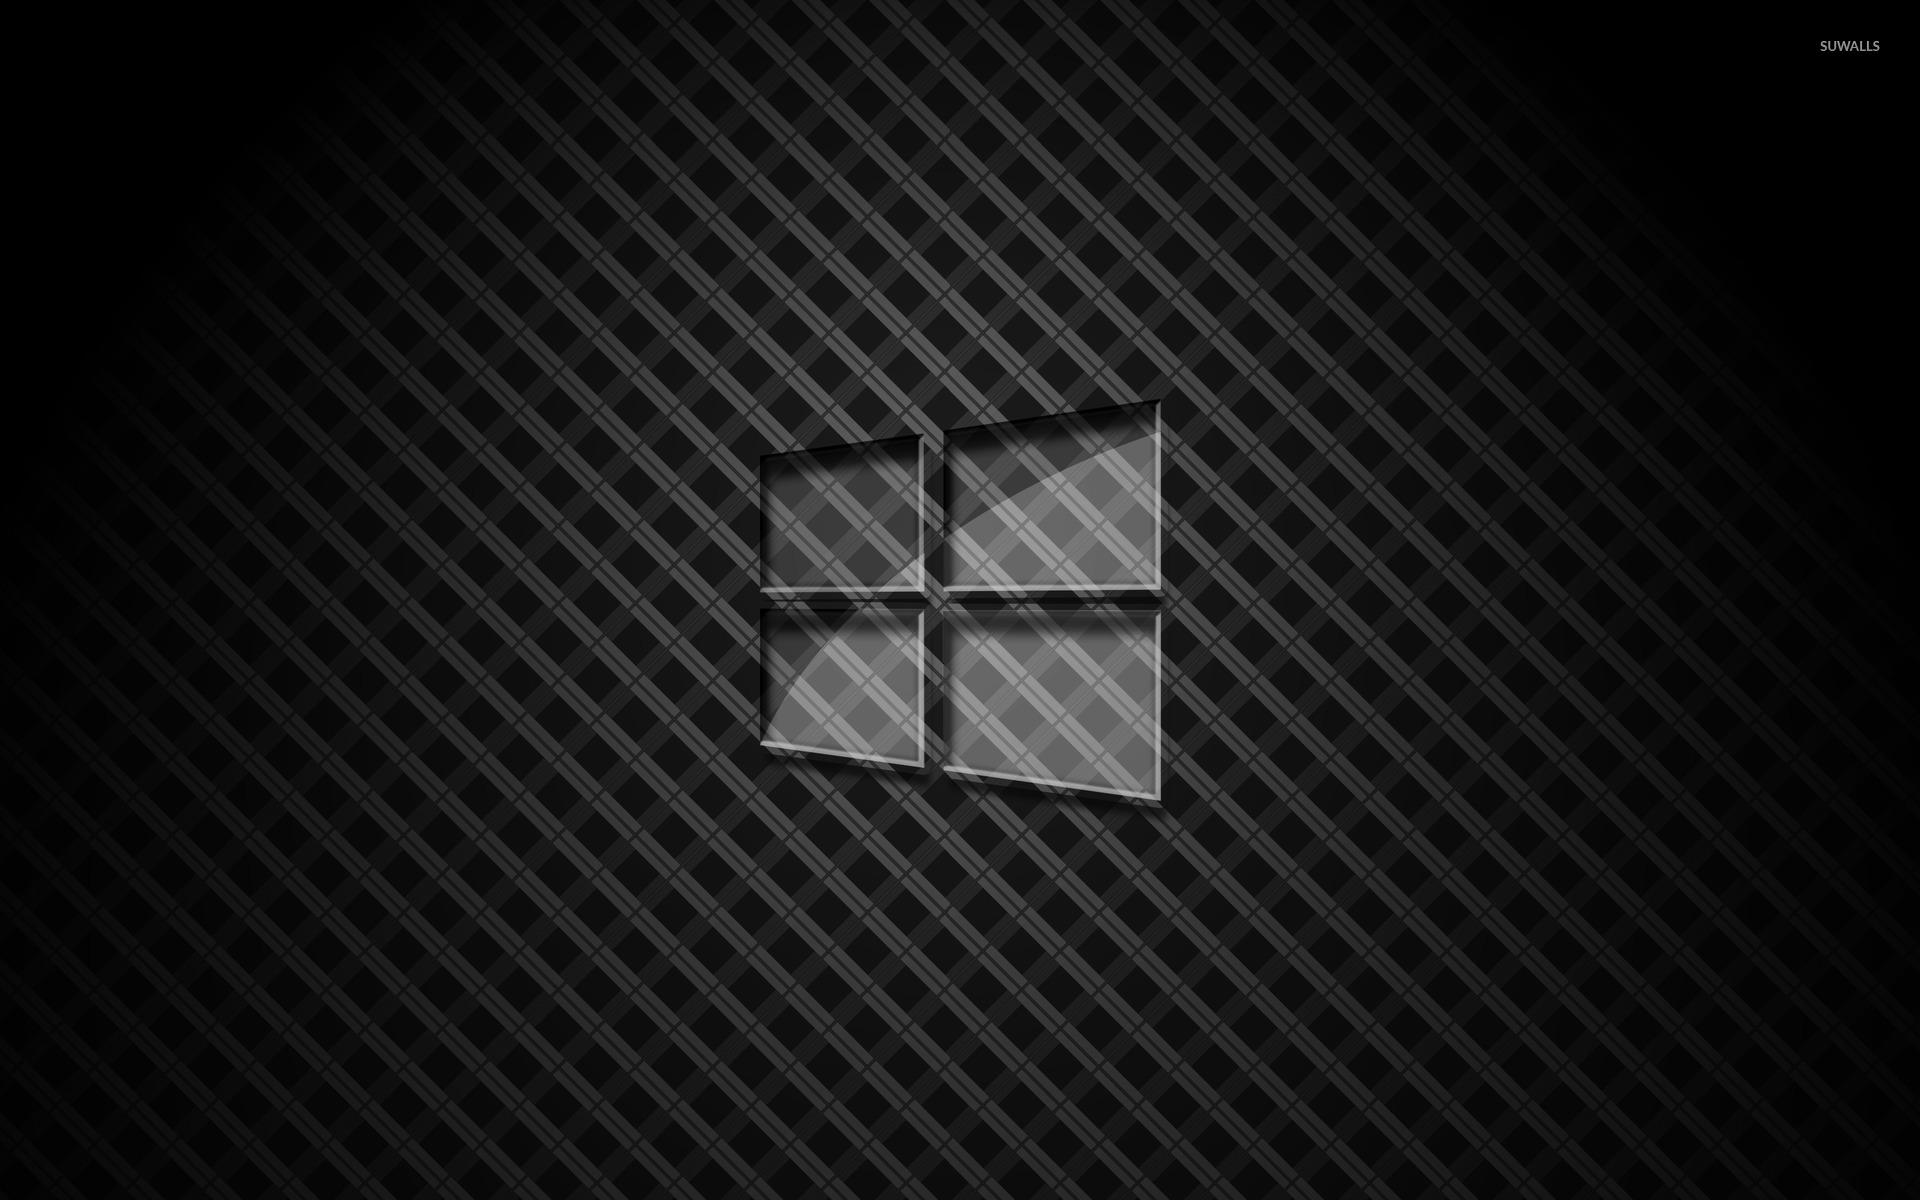 Fall Autumn Computer Wallpaper Glass Windows 10 On Square Pattern 2 Wallpaper